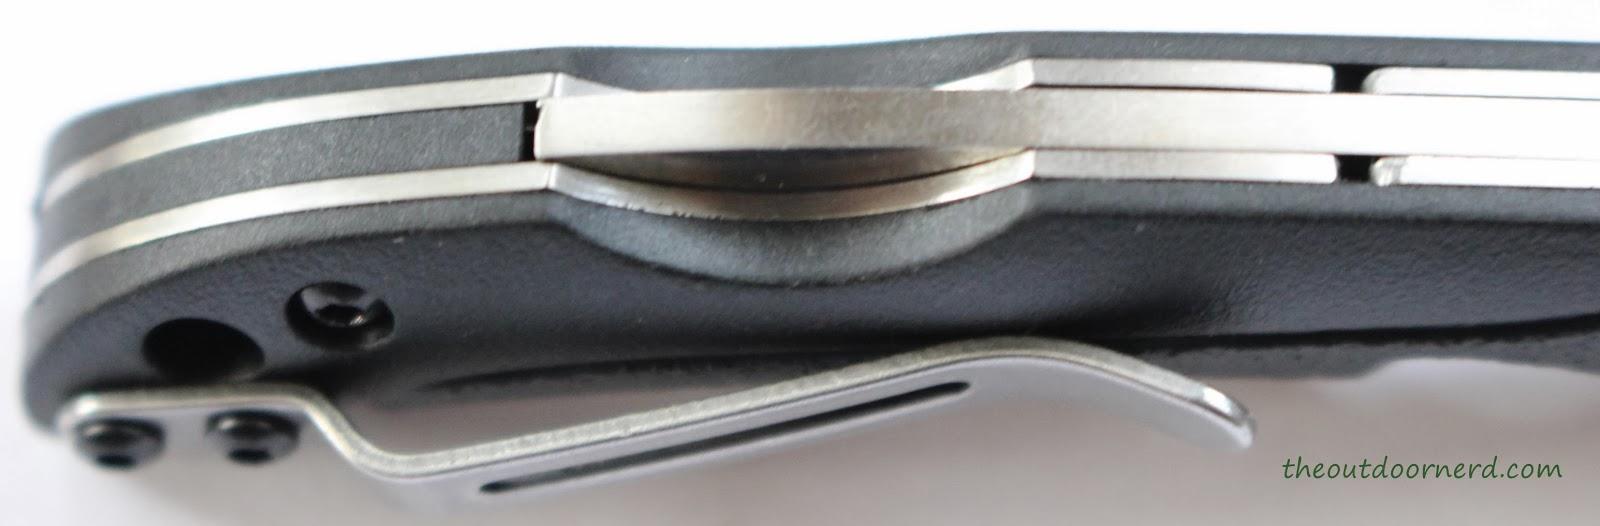 SanRenMu ZB-681 Pocket Knife - Closeup Of Back Lock